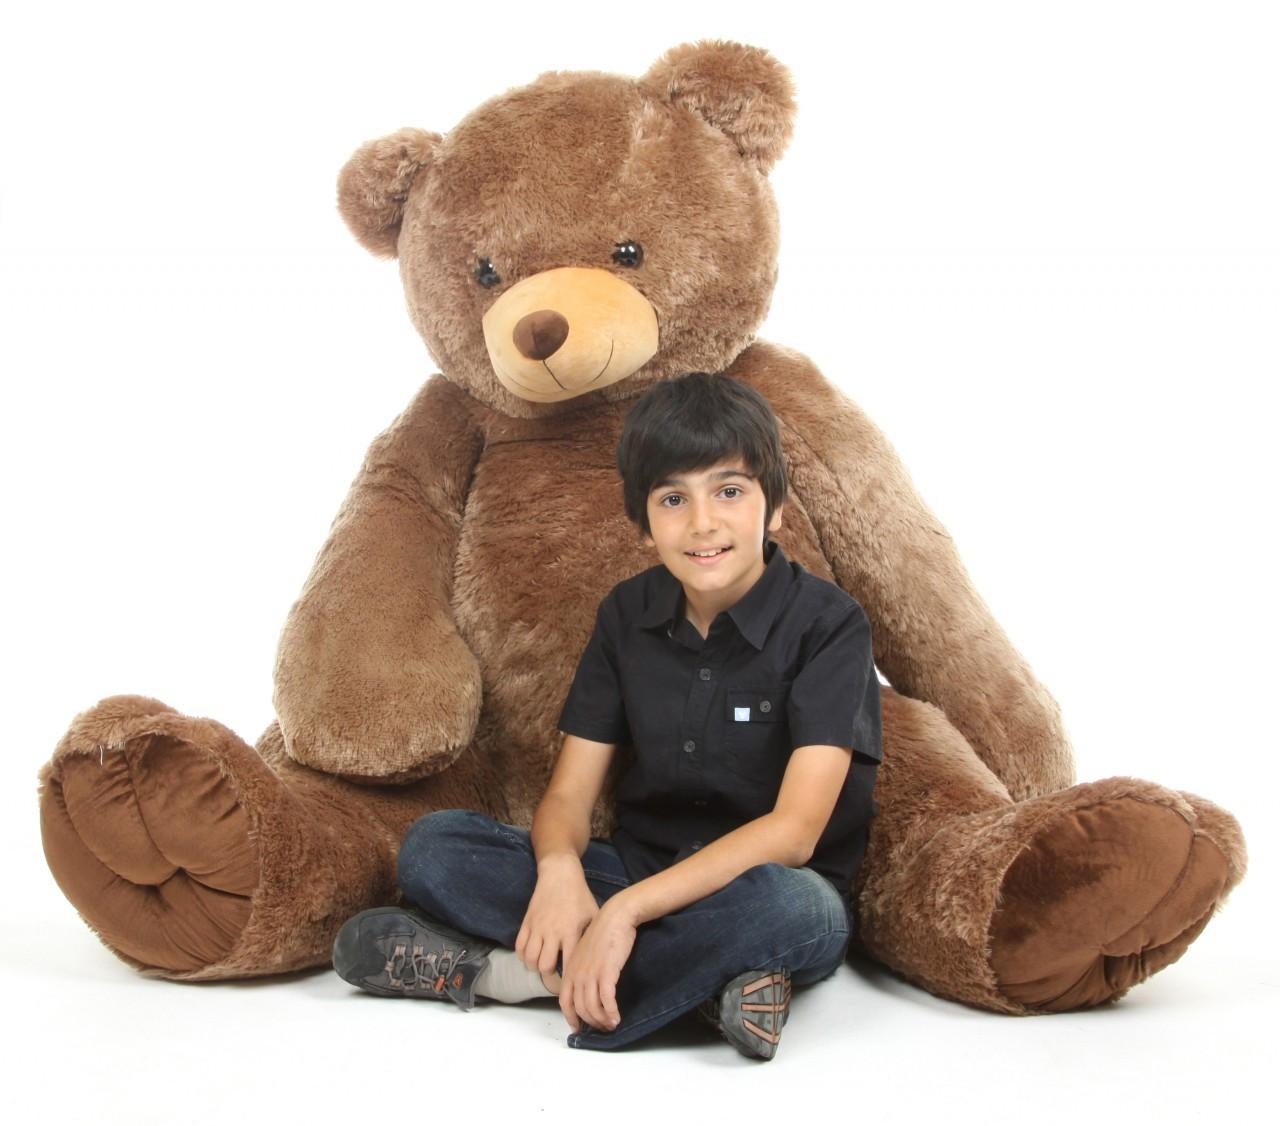 Life Size 65in Mocha Brown Sweetie Tubs Teddy Bear